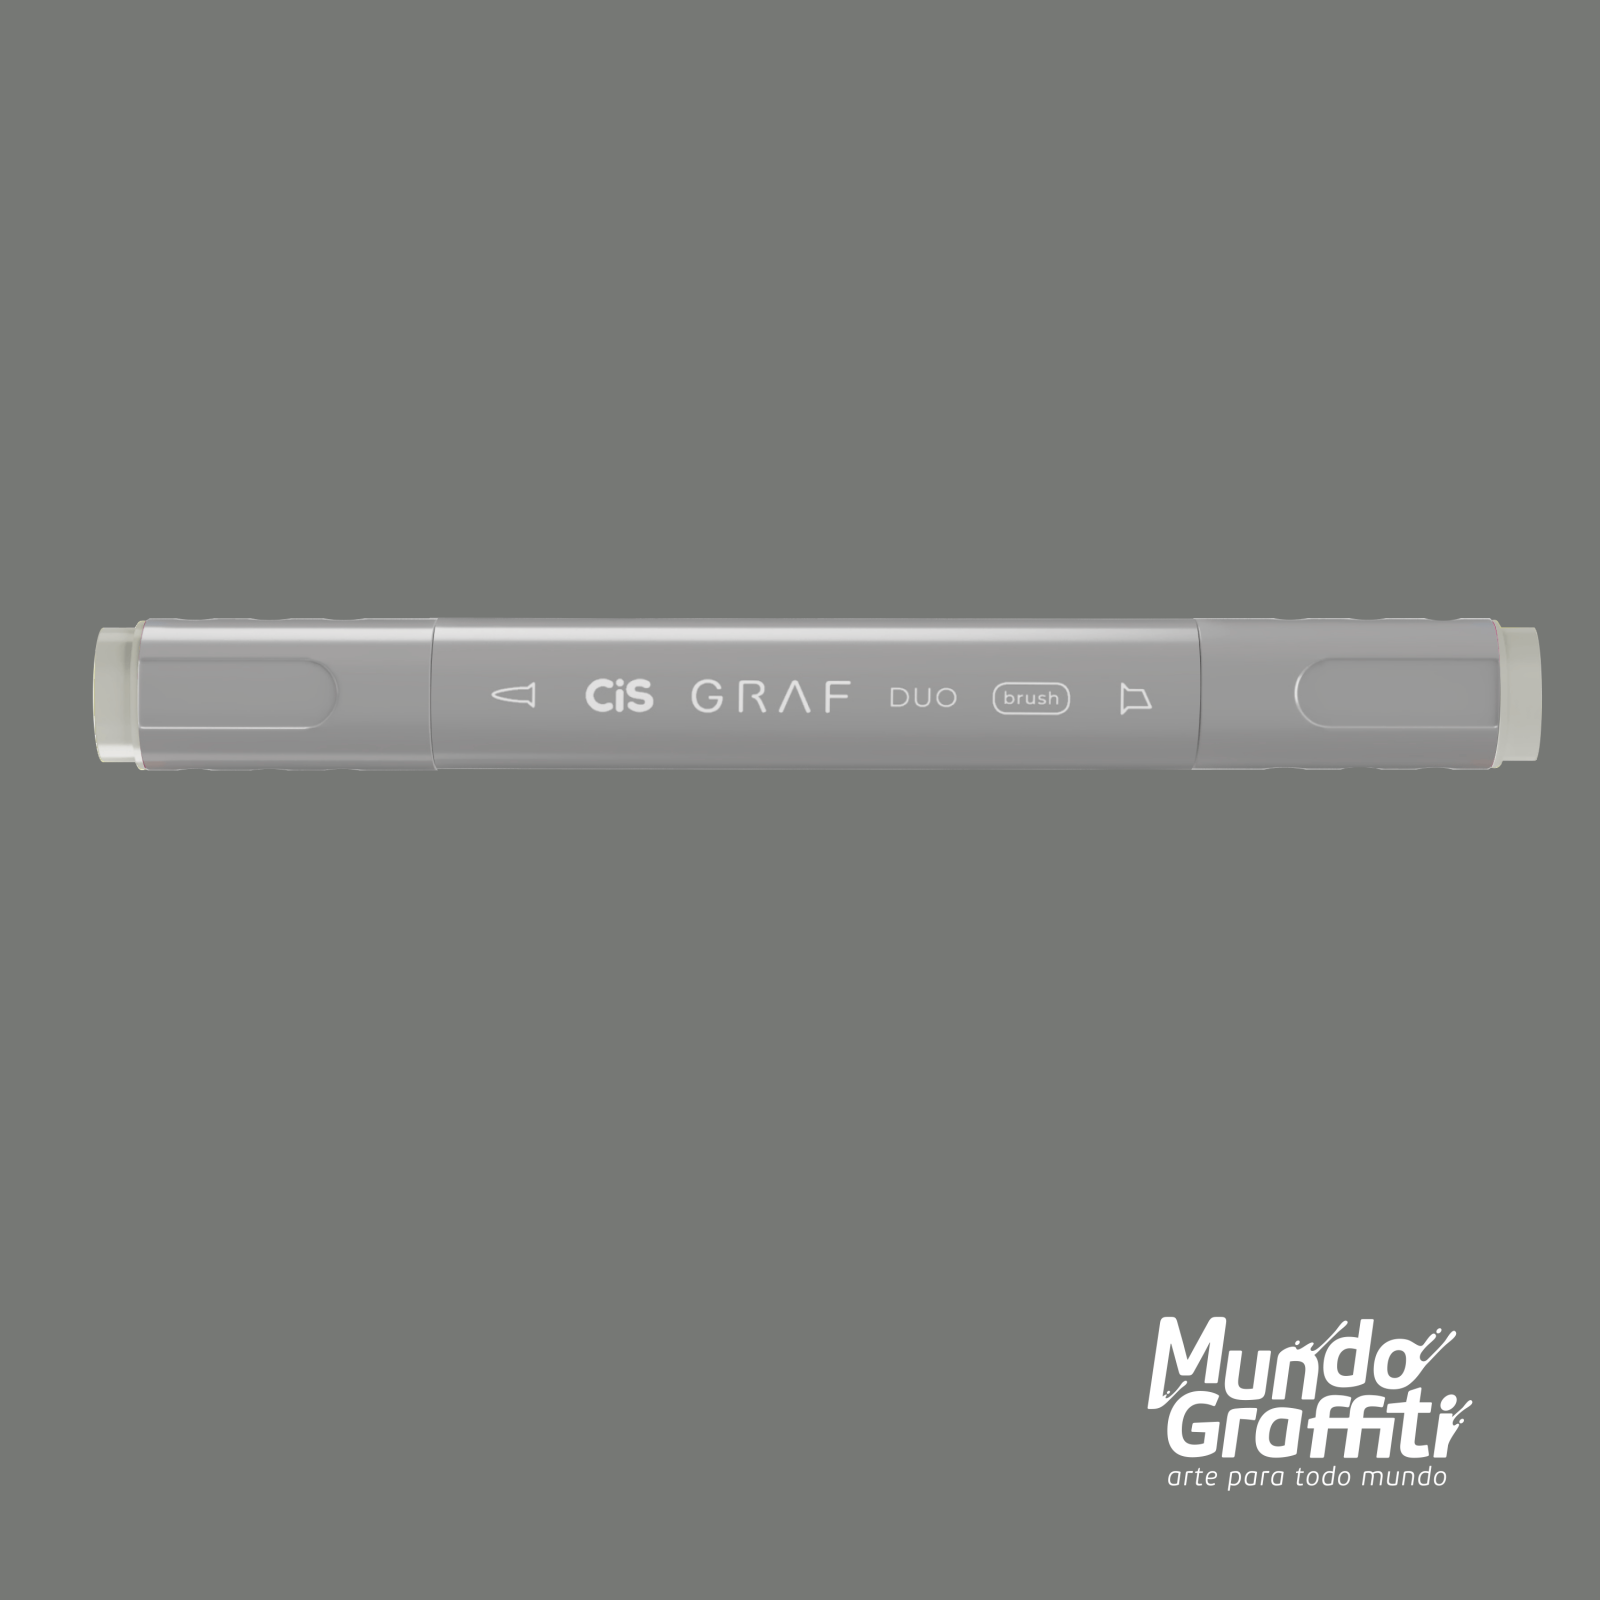 Marcador Cis Graf Duo Brush Cool Grey CG3 - Mundo Graffiti